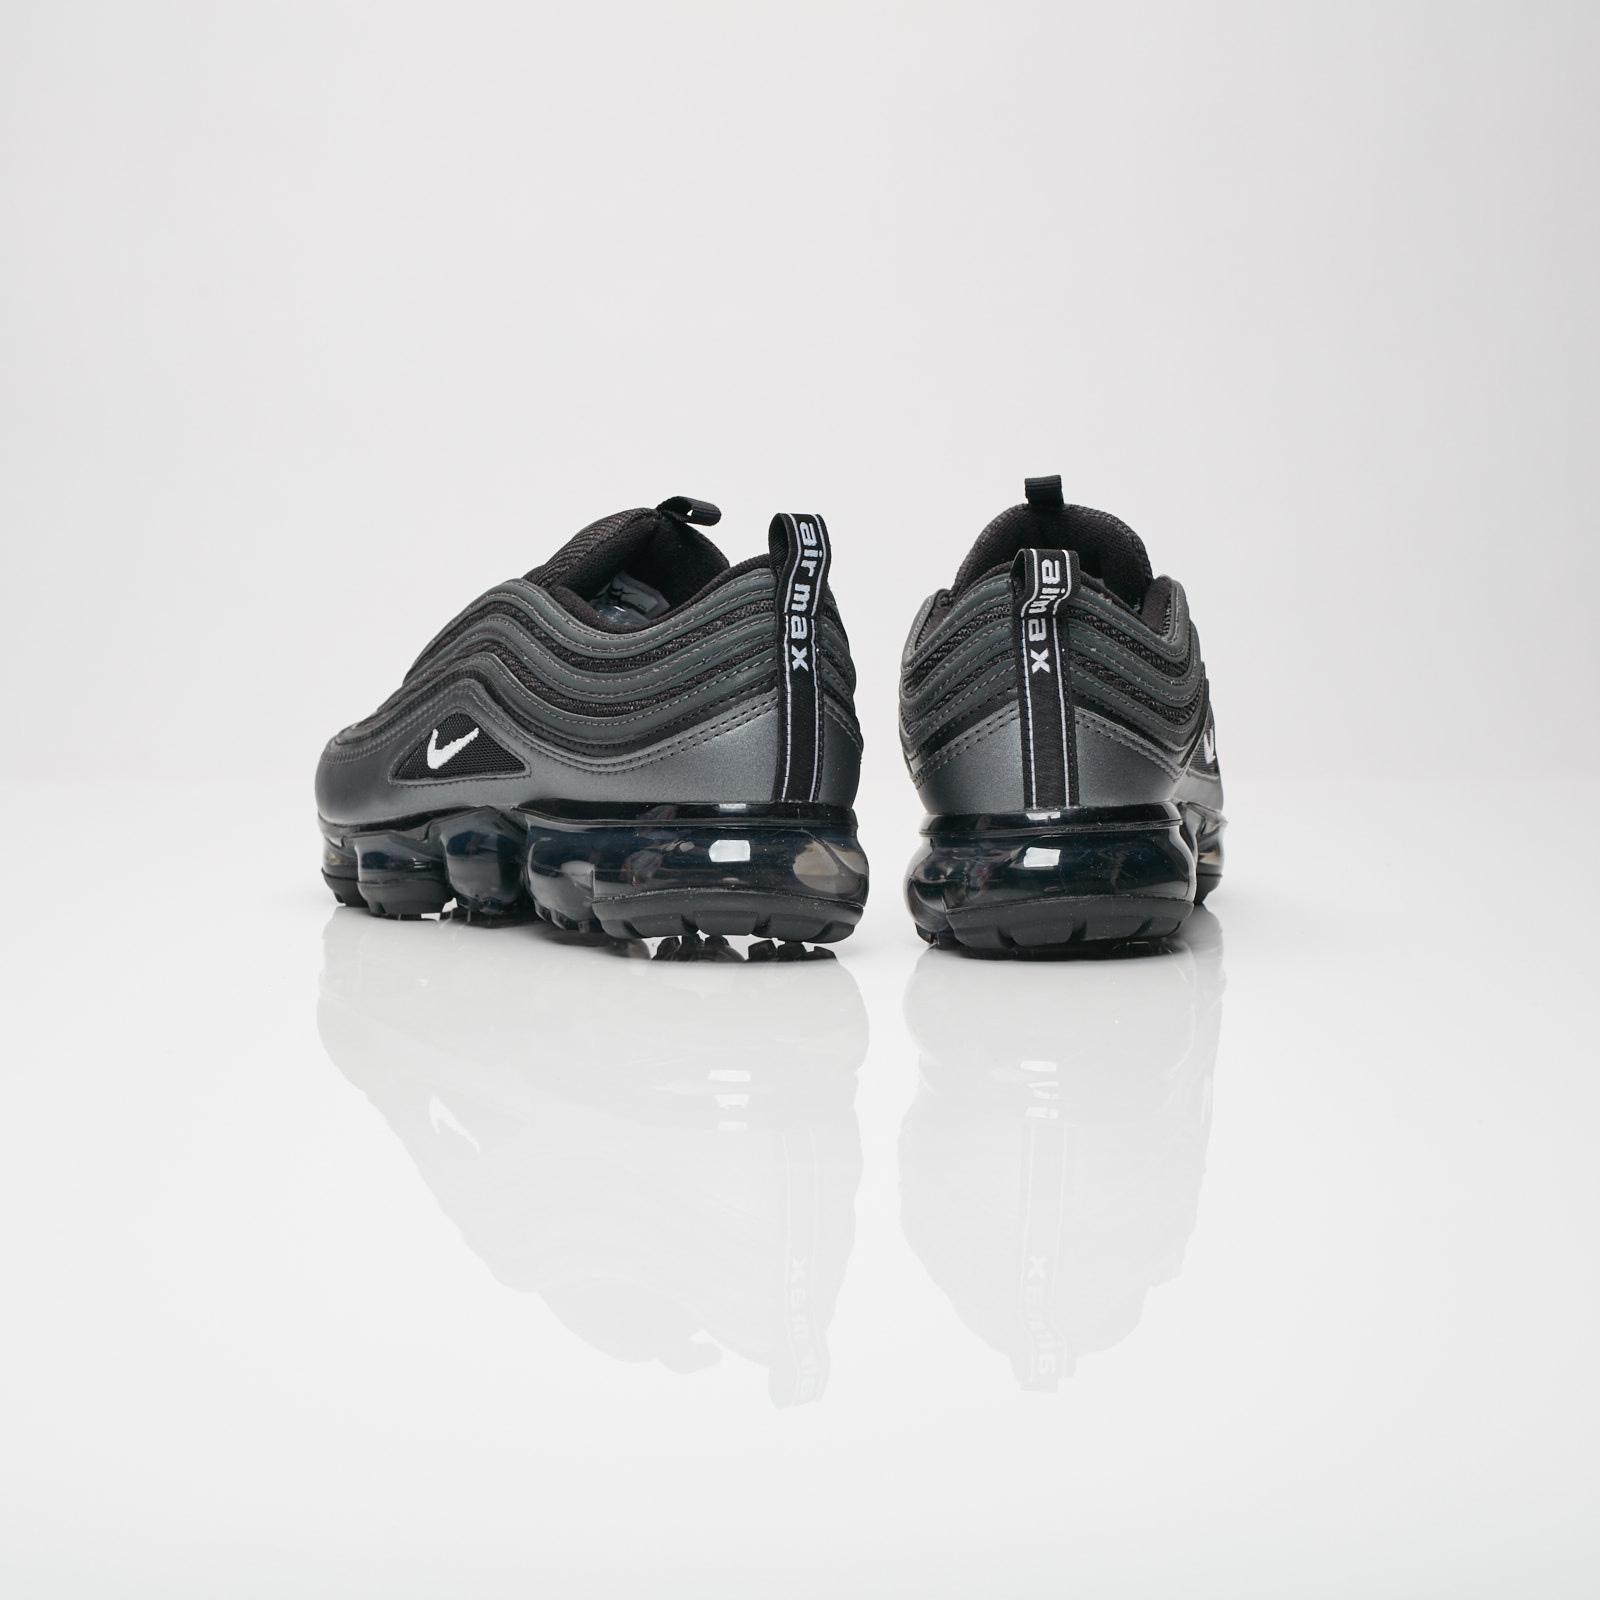 ddc1646e2e677 Nike W Air Vapormax 97 - Ao4542-001 - Sneakersnstuff